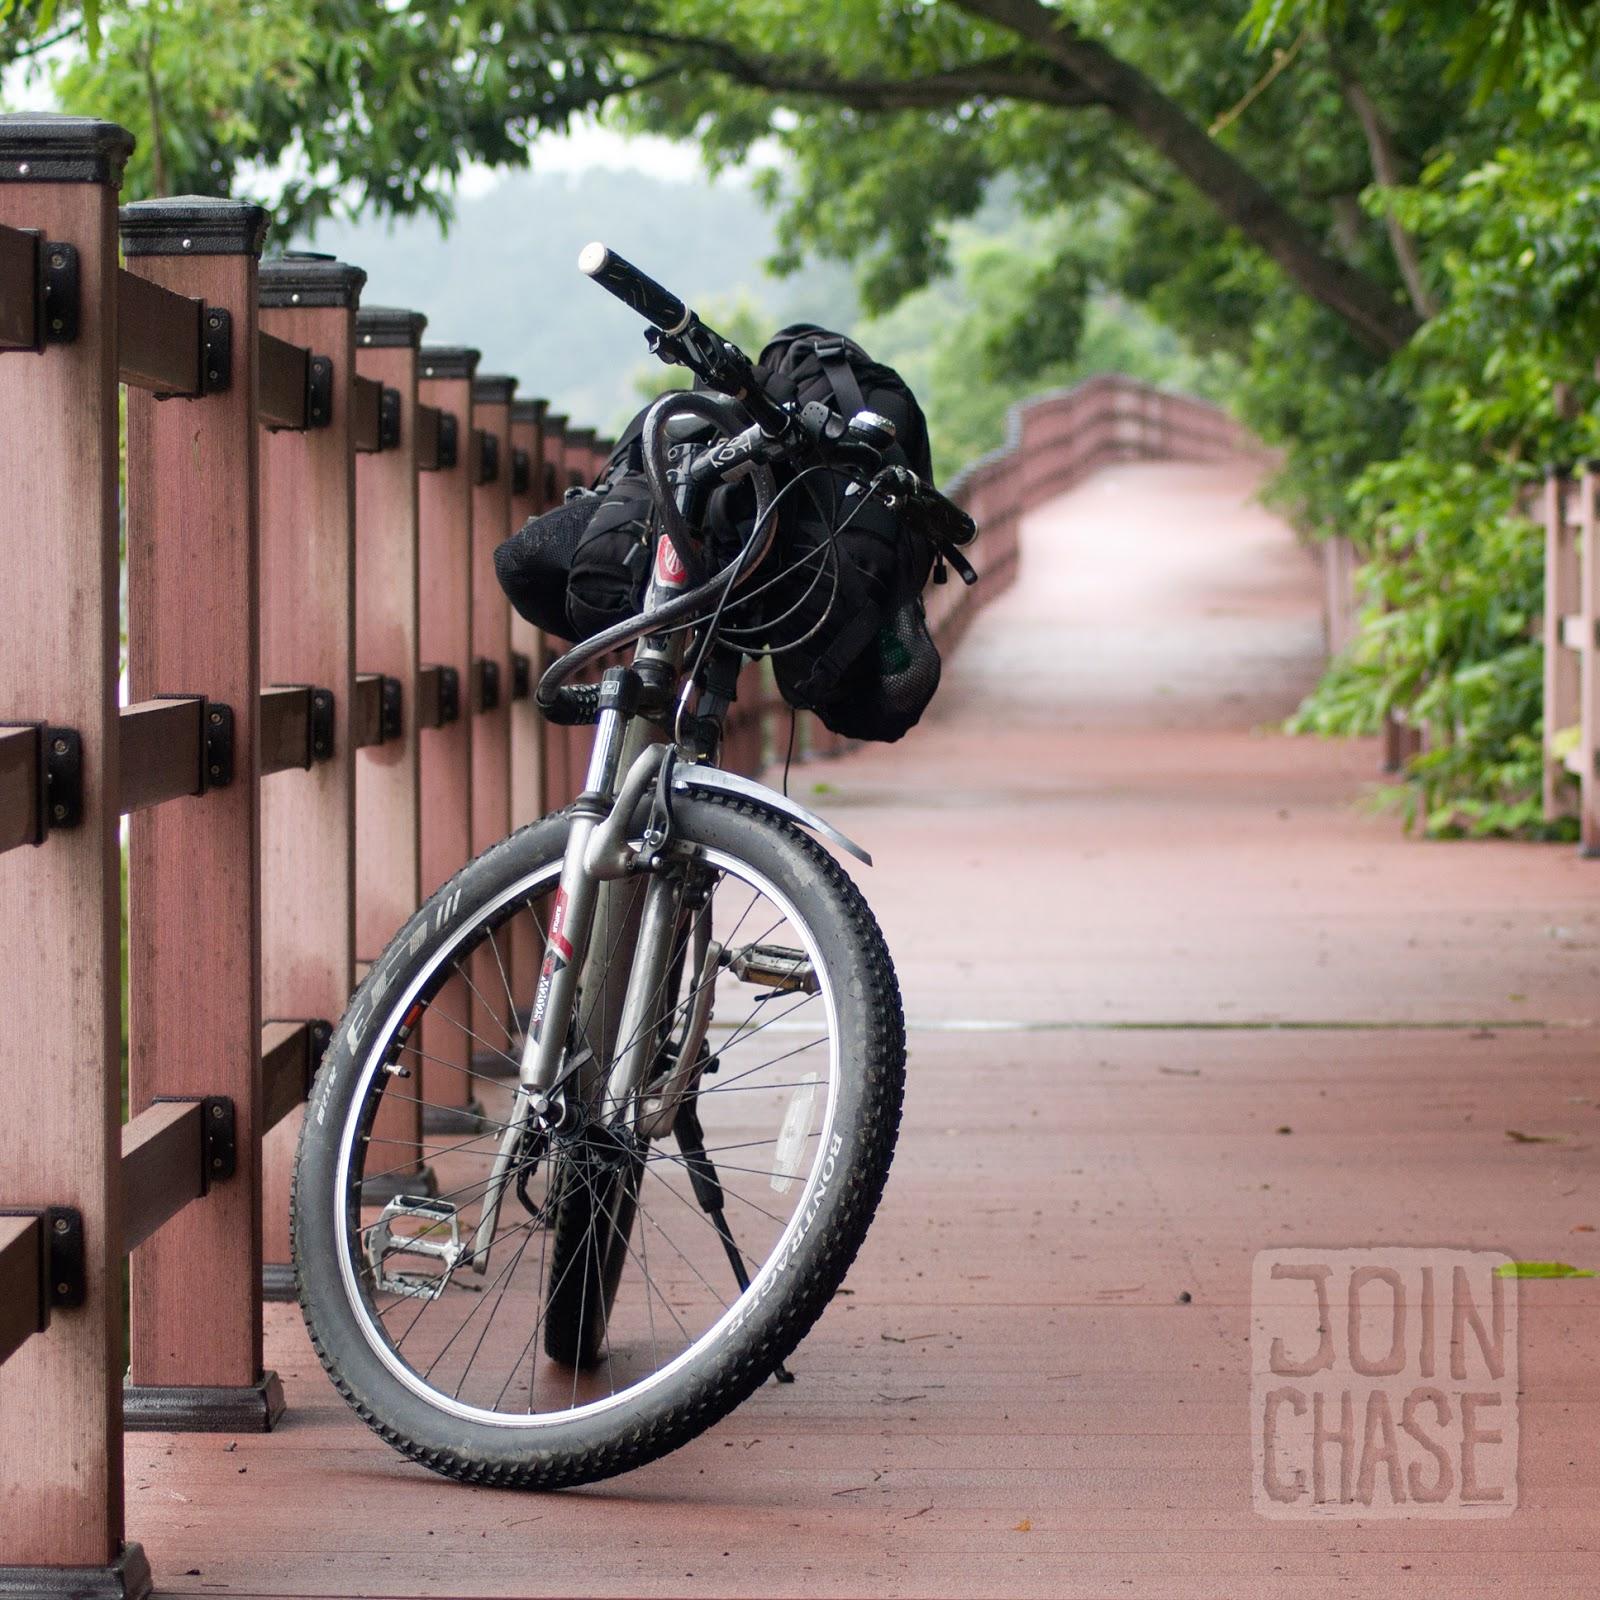 A bike on a wooden bridge along the Geum River Bike Path in South Korea.